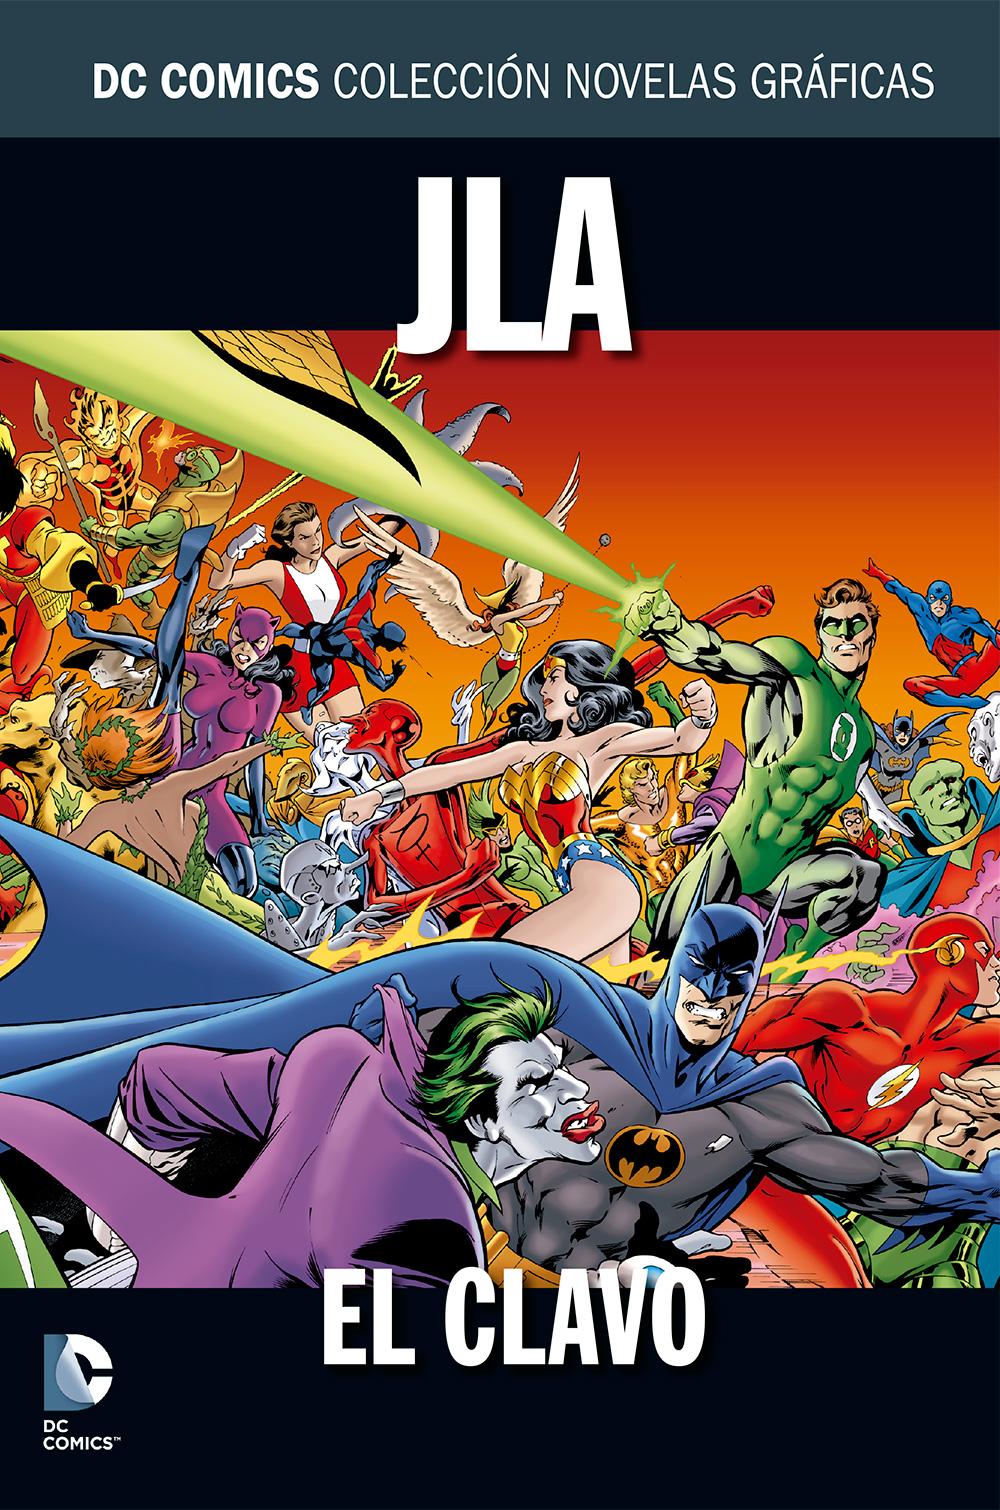 41-44 - [DC - Salvat] La Colección de Novelas Gráficas de DC Comics  SF118_030_01_001